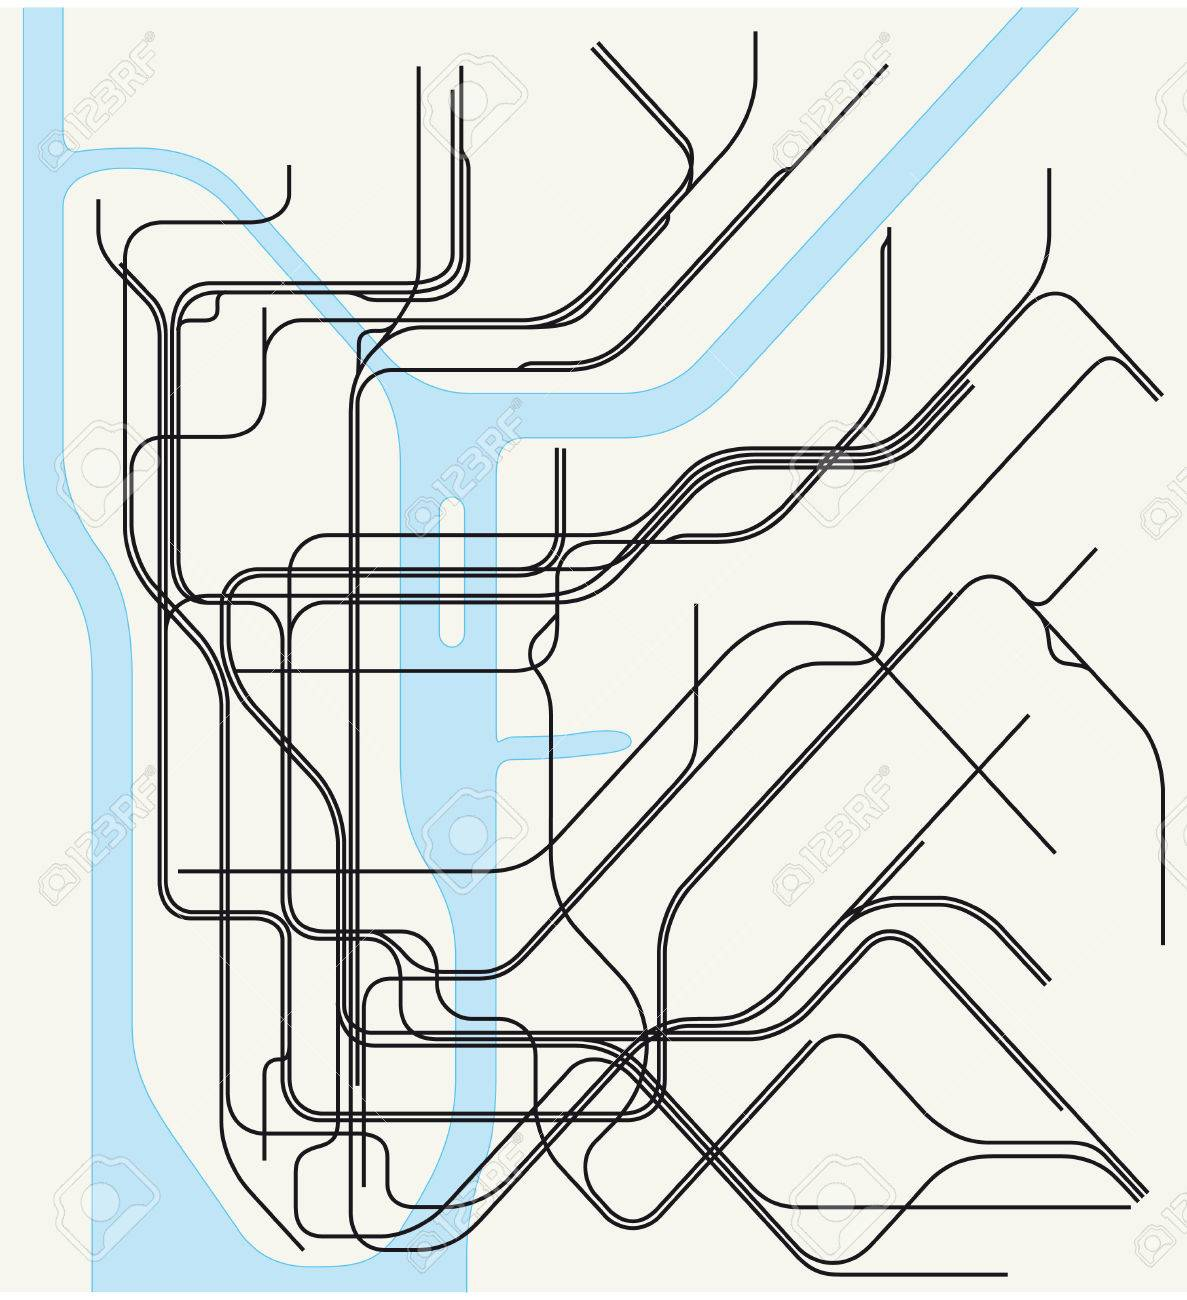 Free Ny Subway Map.New York Subway Map